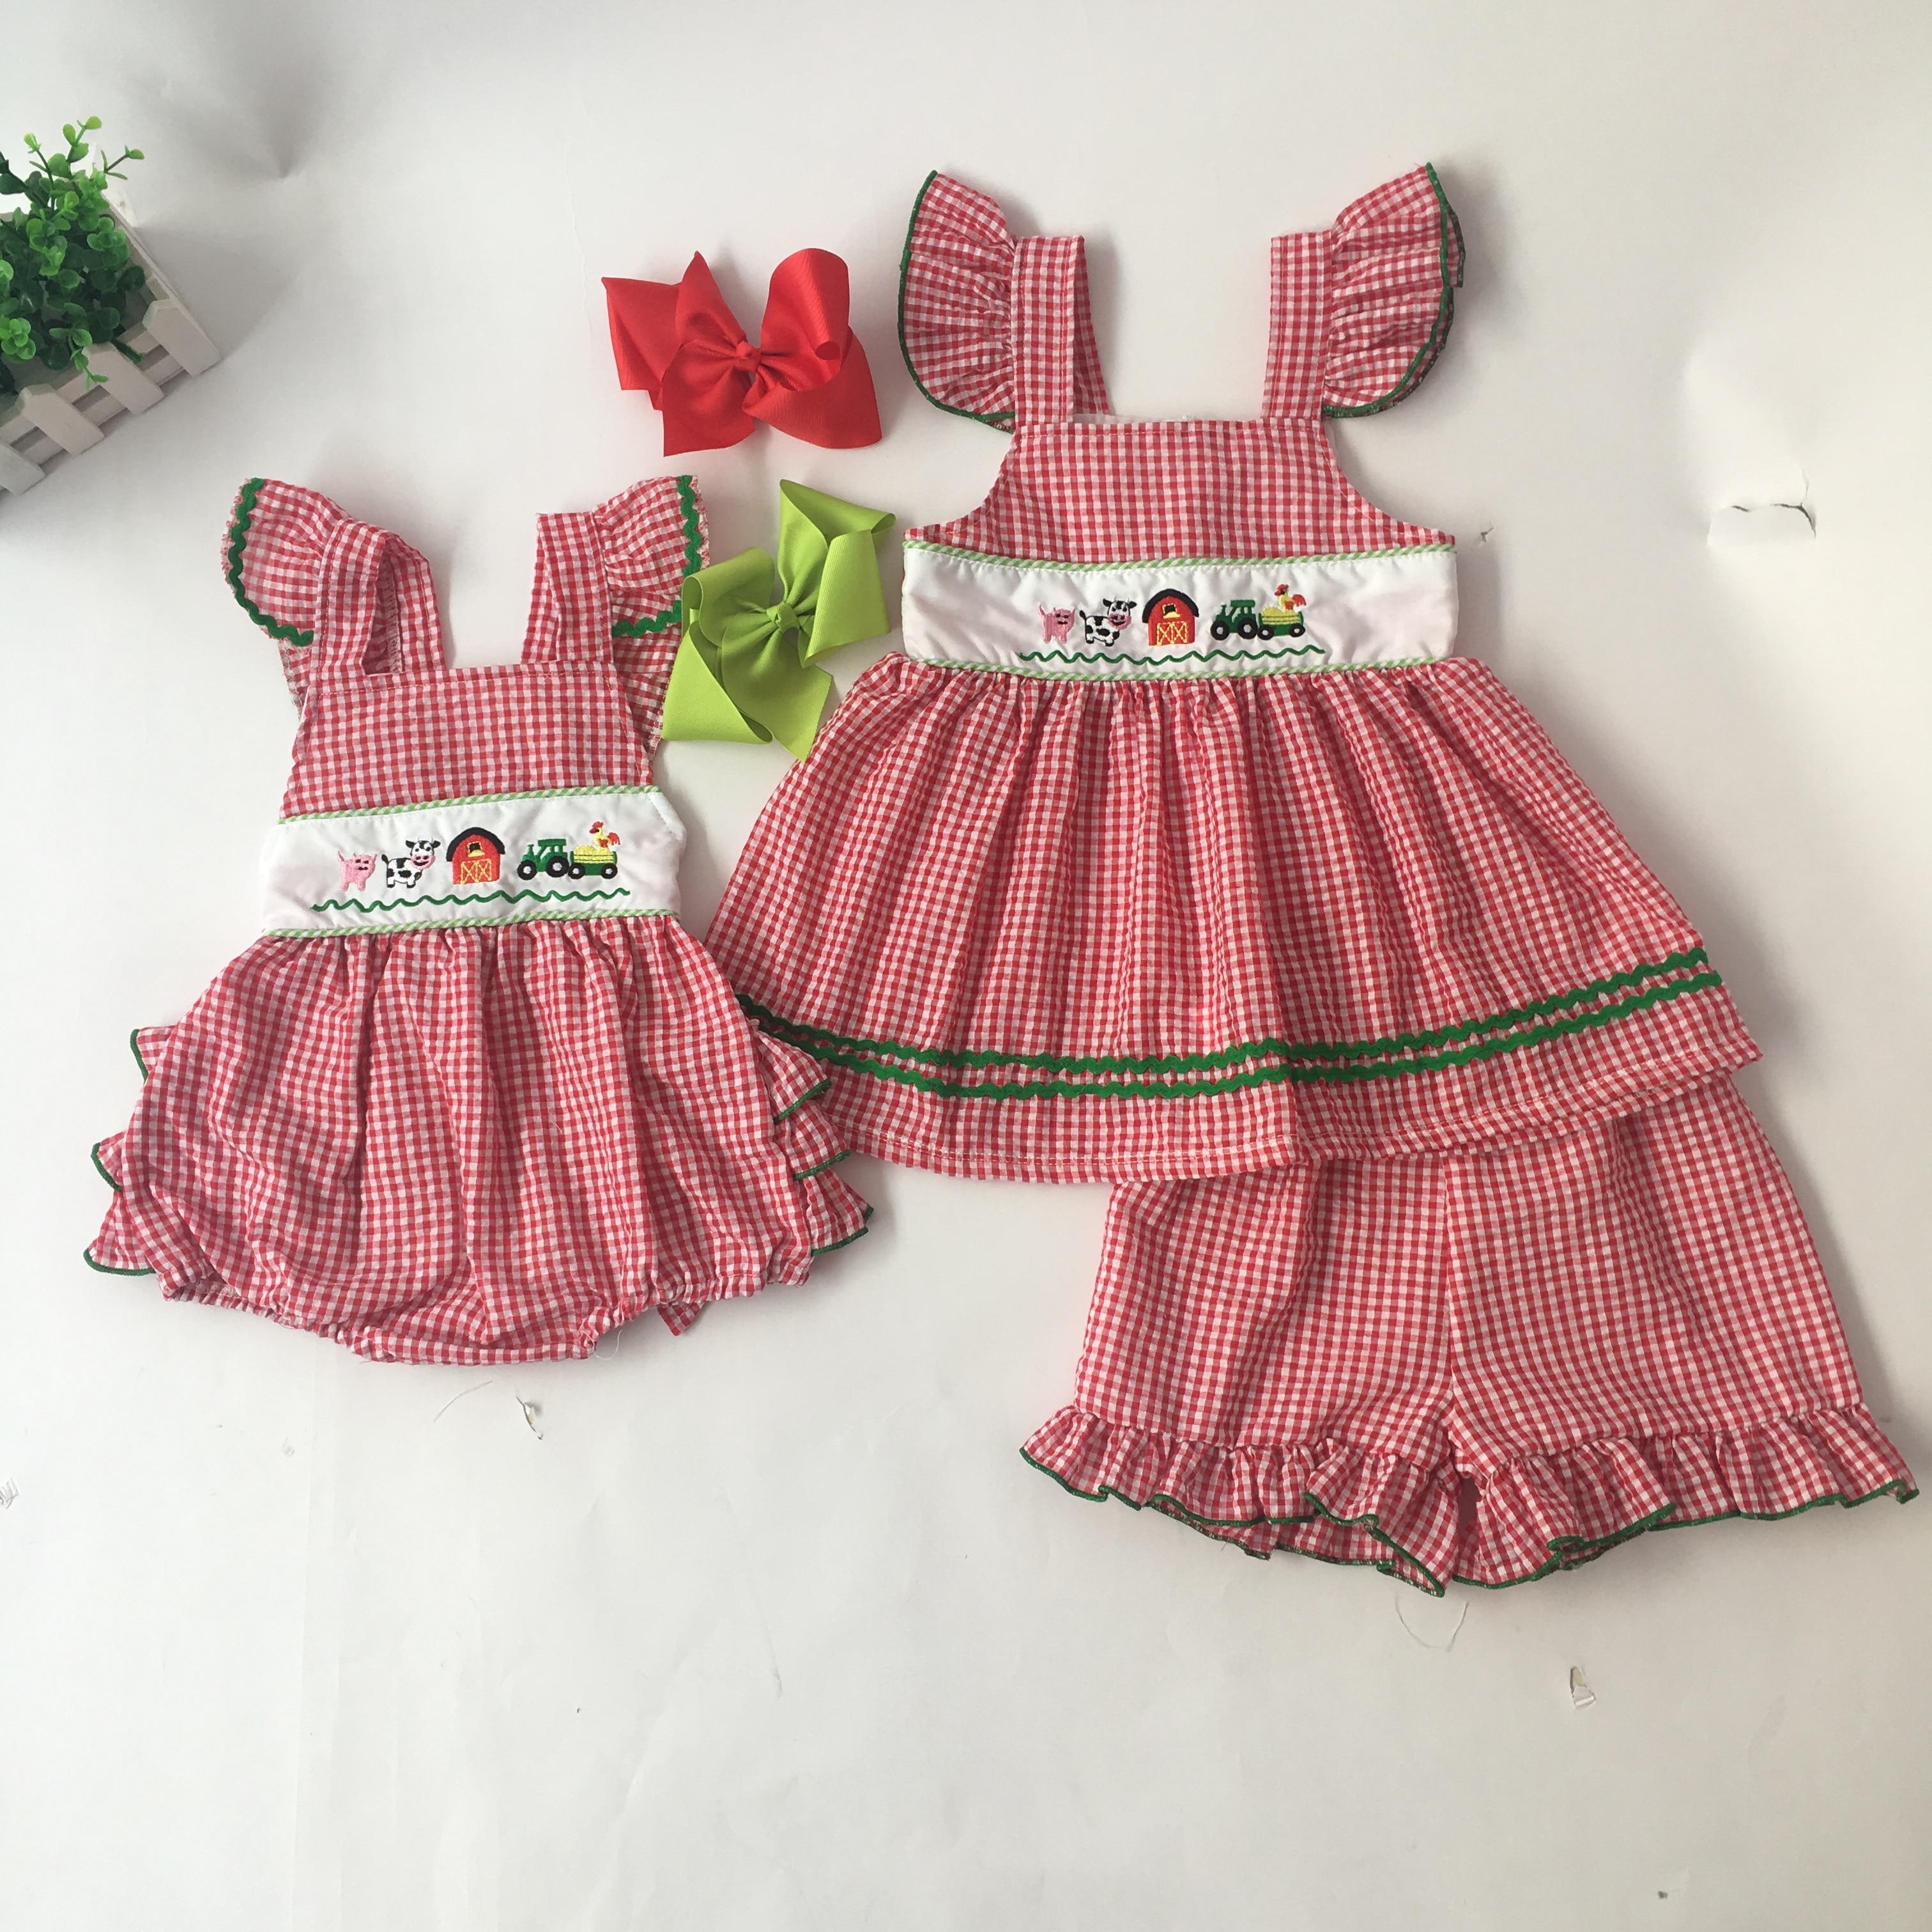 Puresun Fashion Summer Sibling Design Girls Romper Cartoon Pattern Embroidery Bubble Boy Red Gingham Boutique Jon Jon Baby Cloth